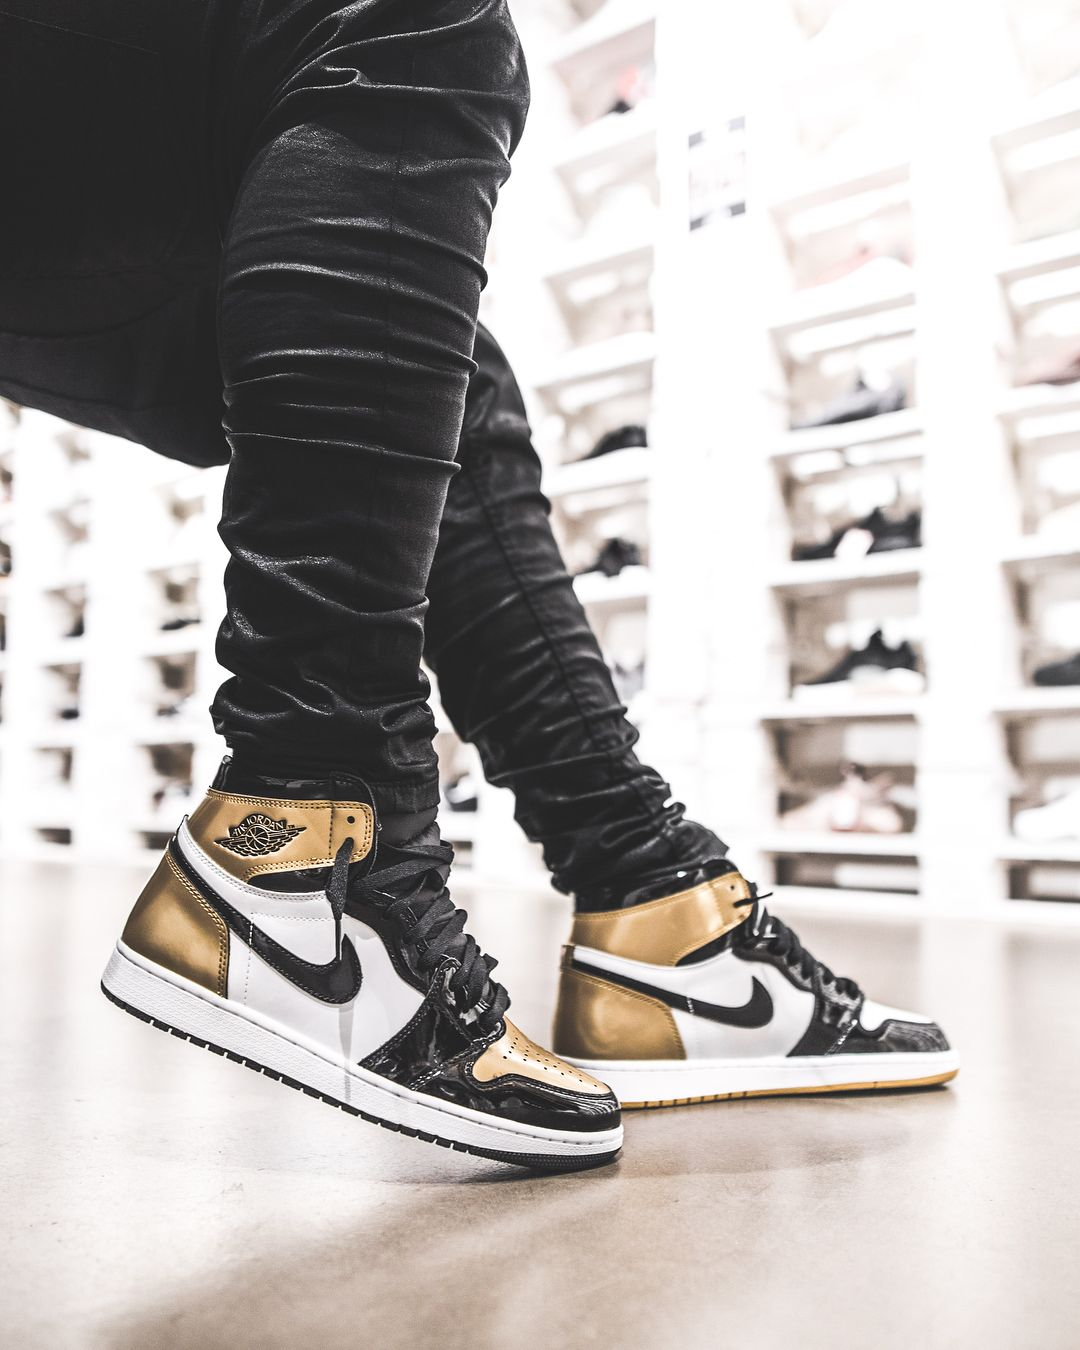 Nike Air Jordan 1 Sneakers Sneakers Men Best Sneakers